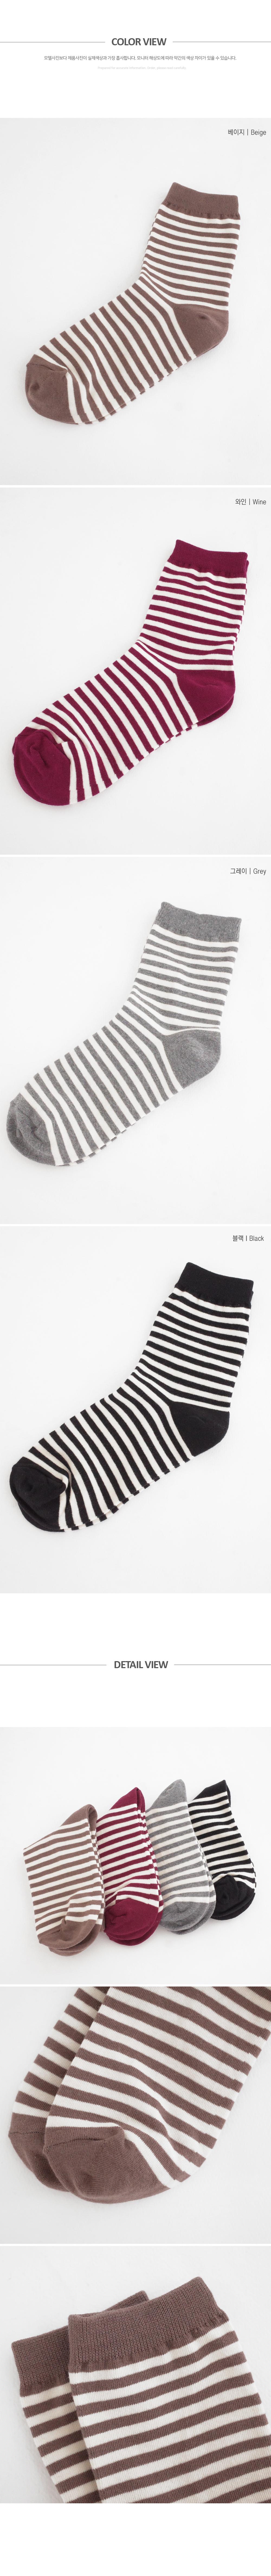 Deep Color Striped Socks